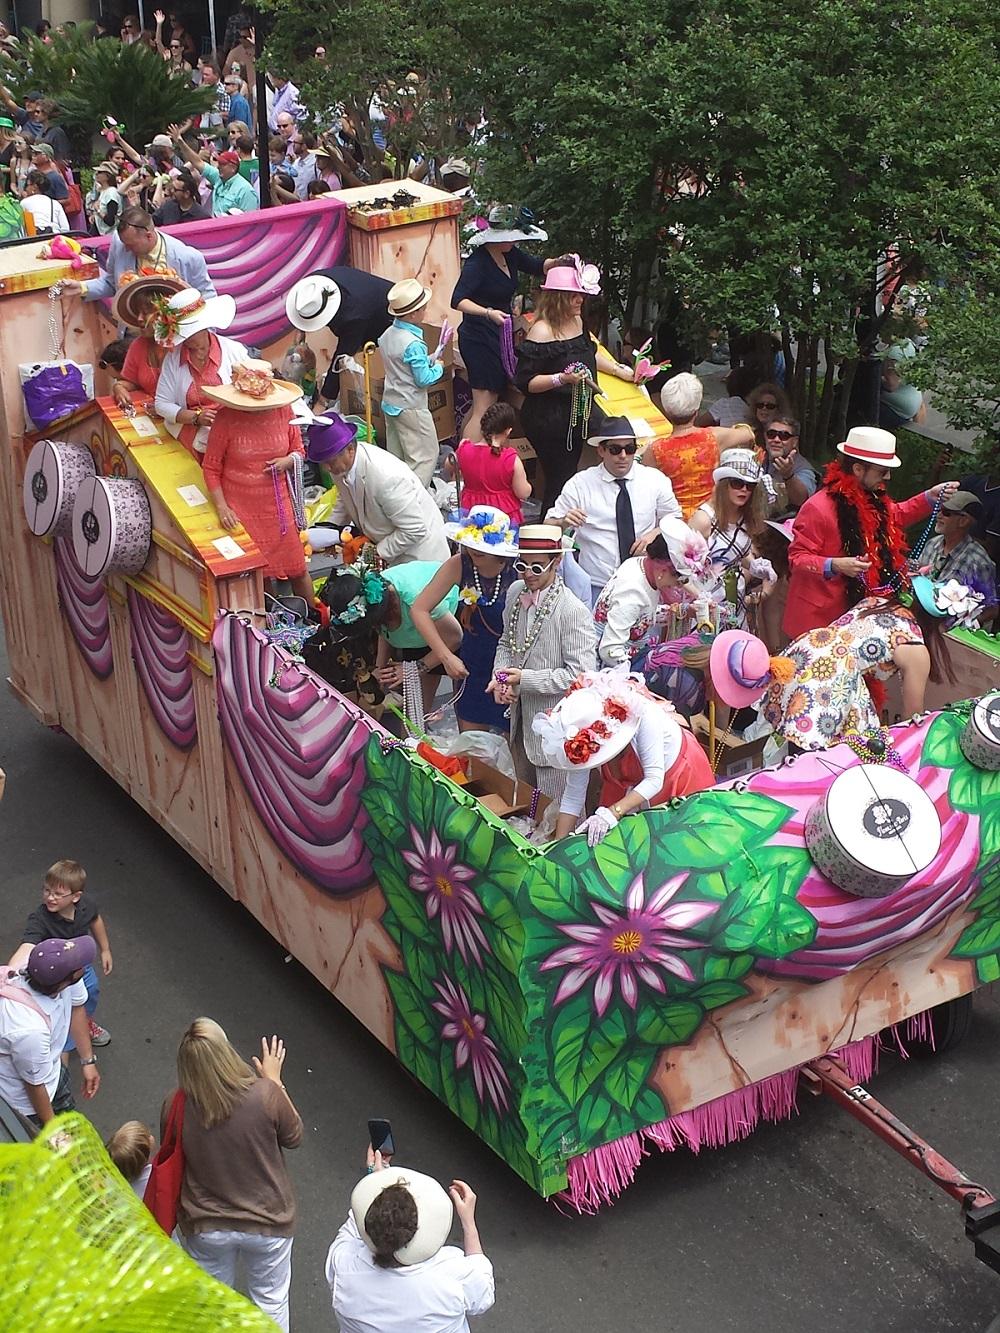 NOLA Parade 4